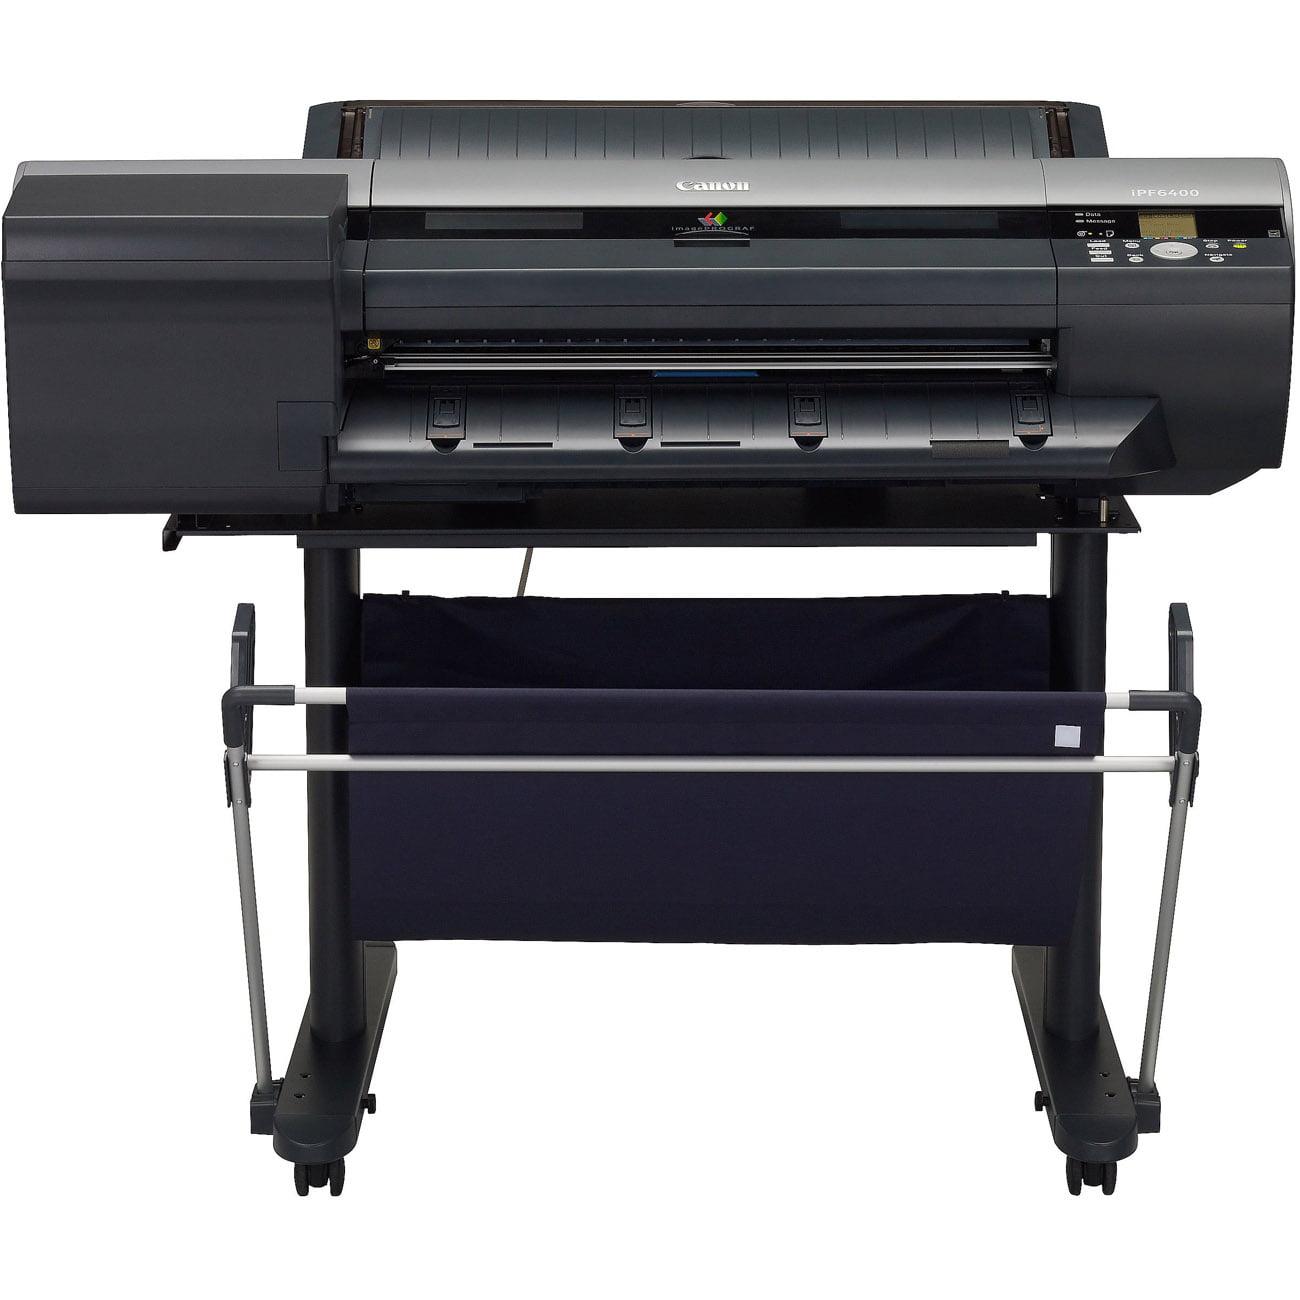 "Canon imagePROGRAF iPF6400 Inkjet Large Format Printer - 24"" - Color 5339B002AA"